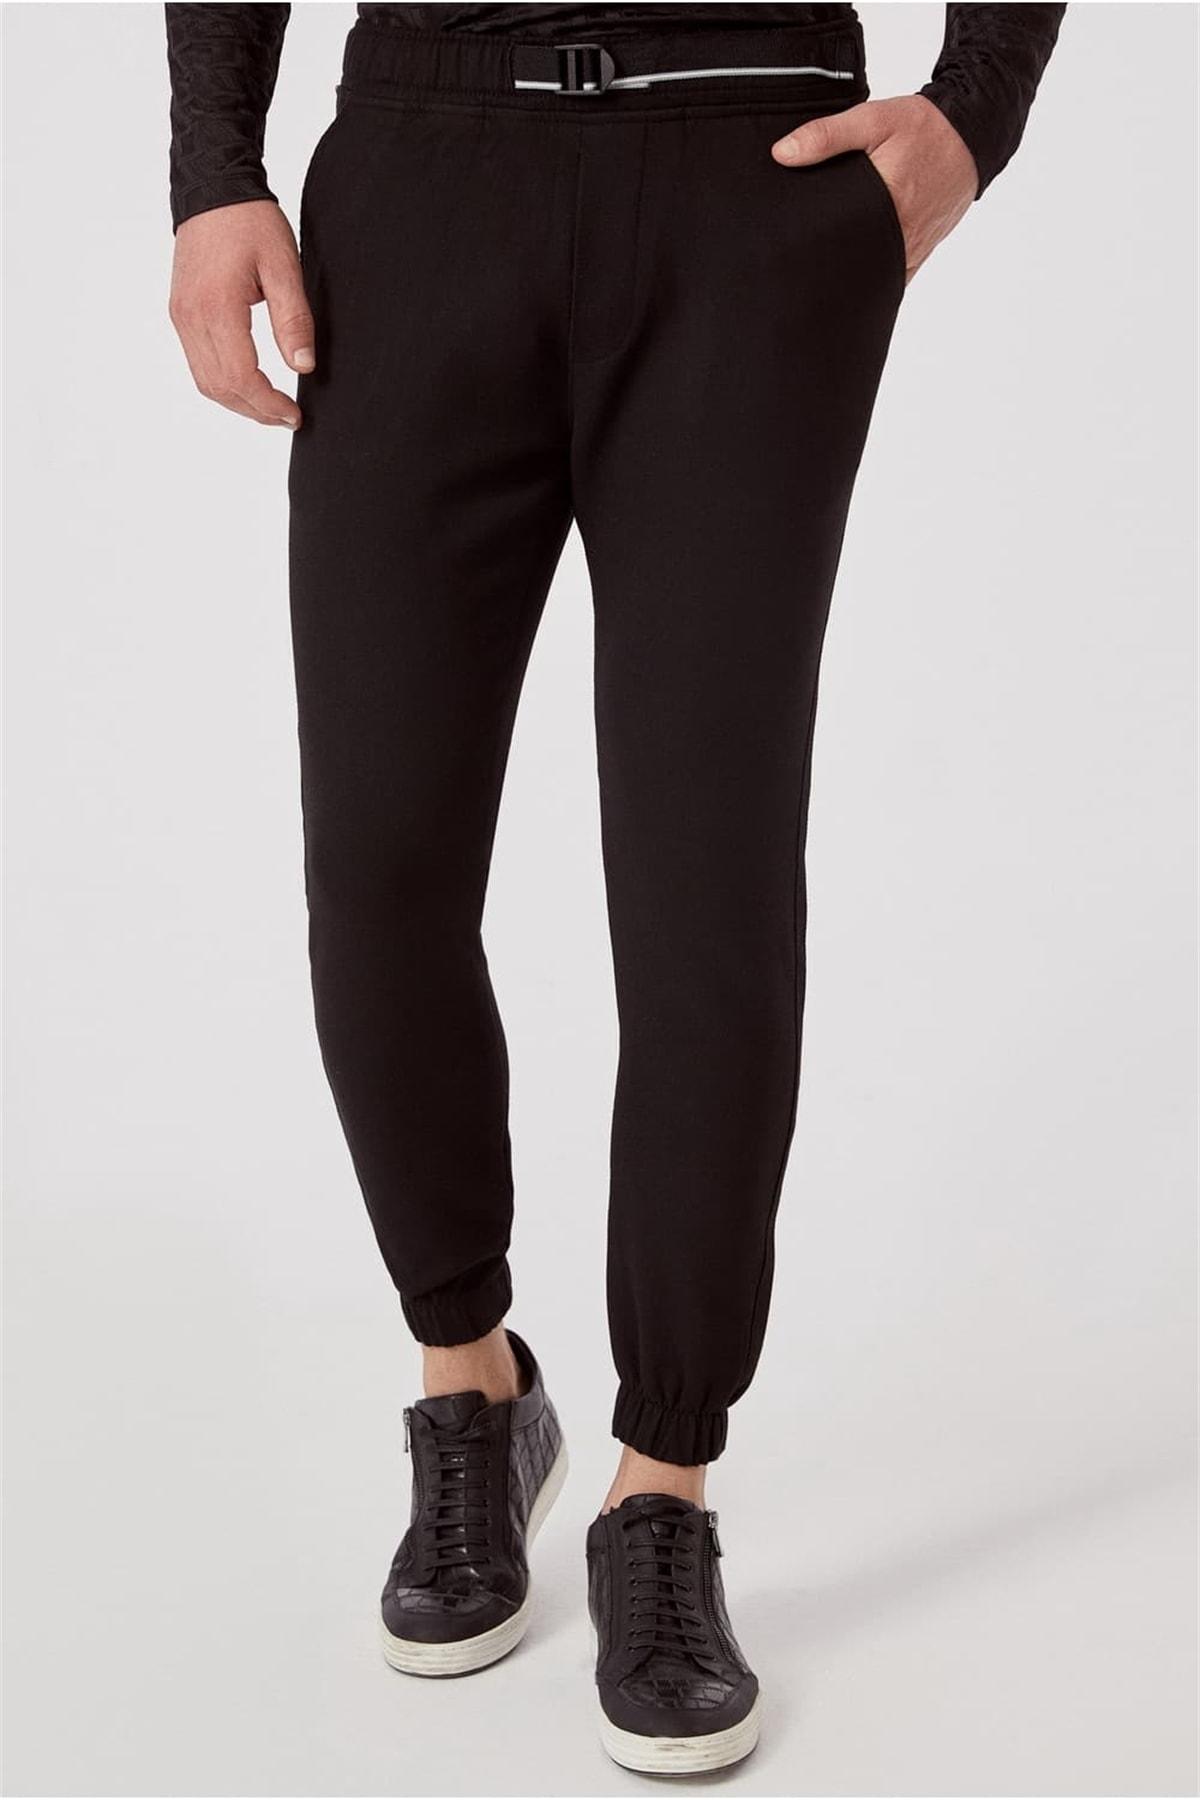 Efor ATP 017 Slim Fit Siyah Spor Pantolon